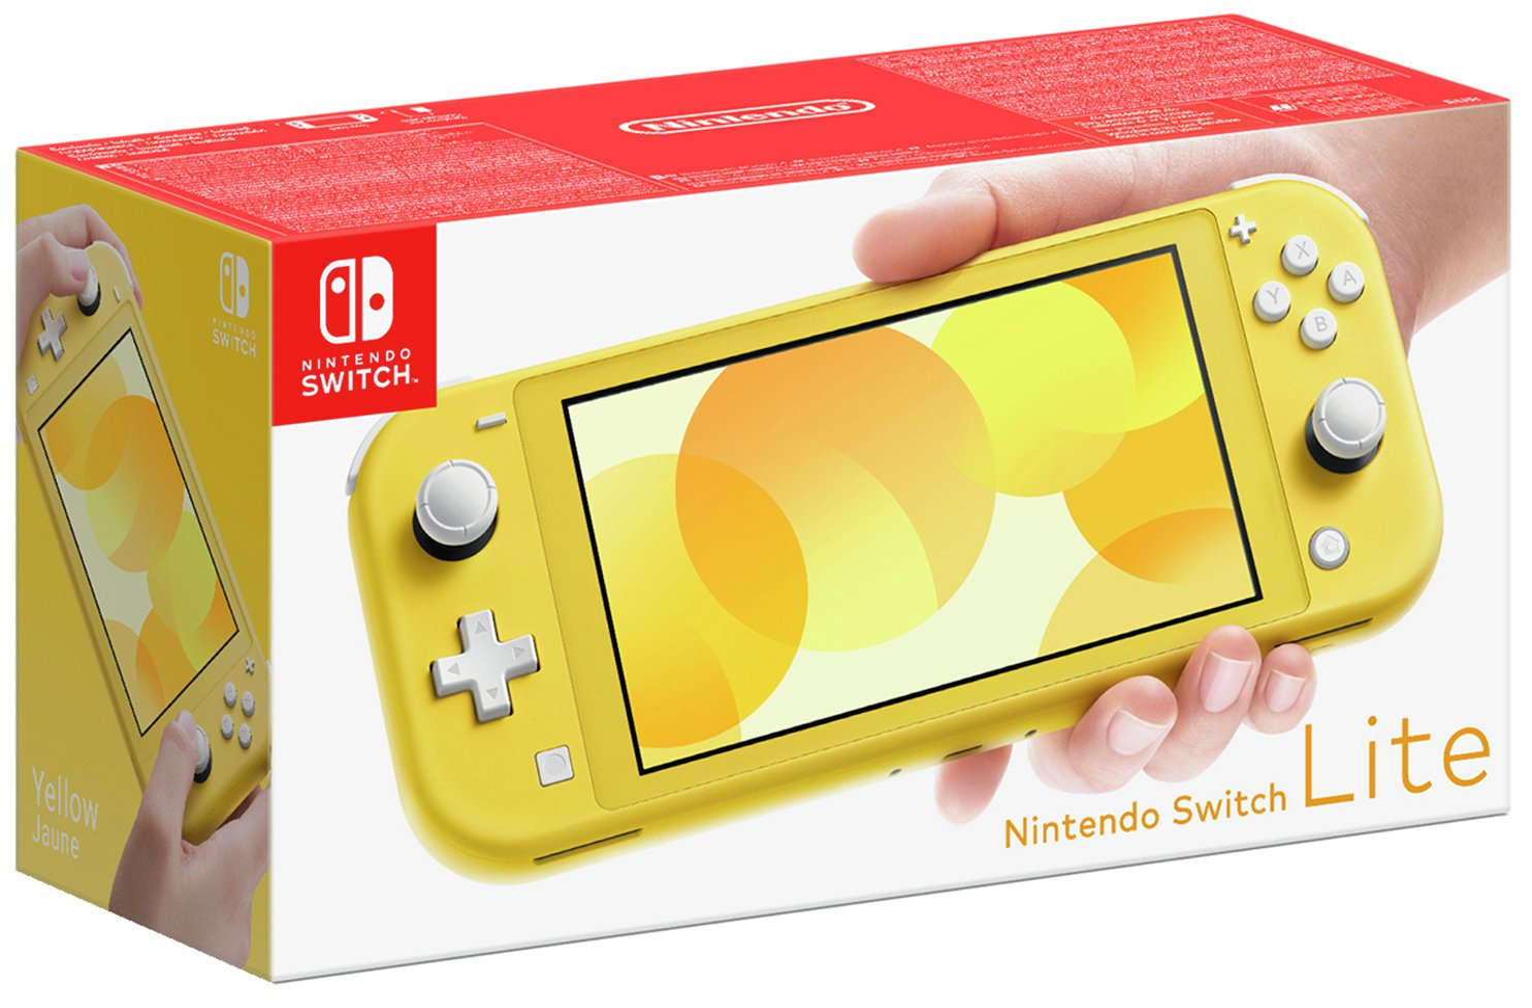 Nintendo Switch Lite Handheld Console